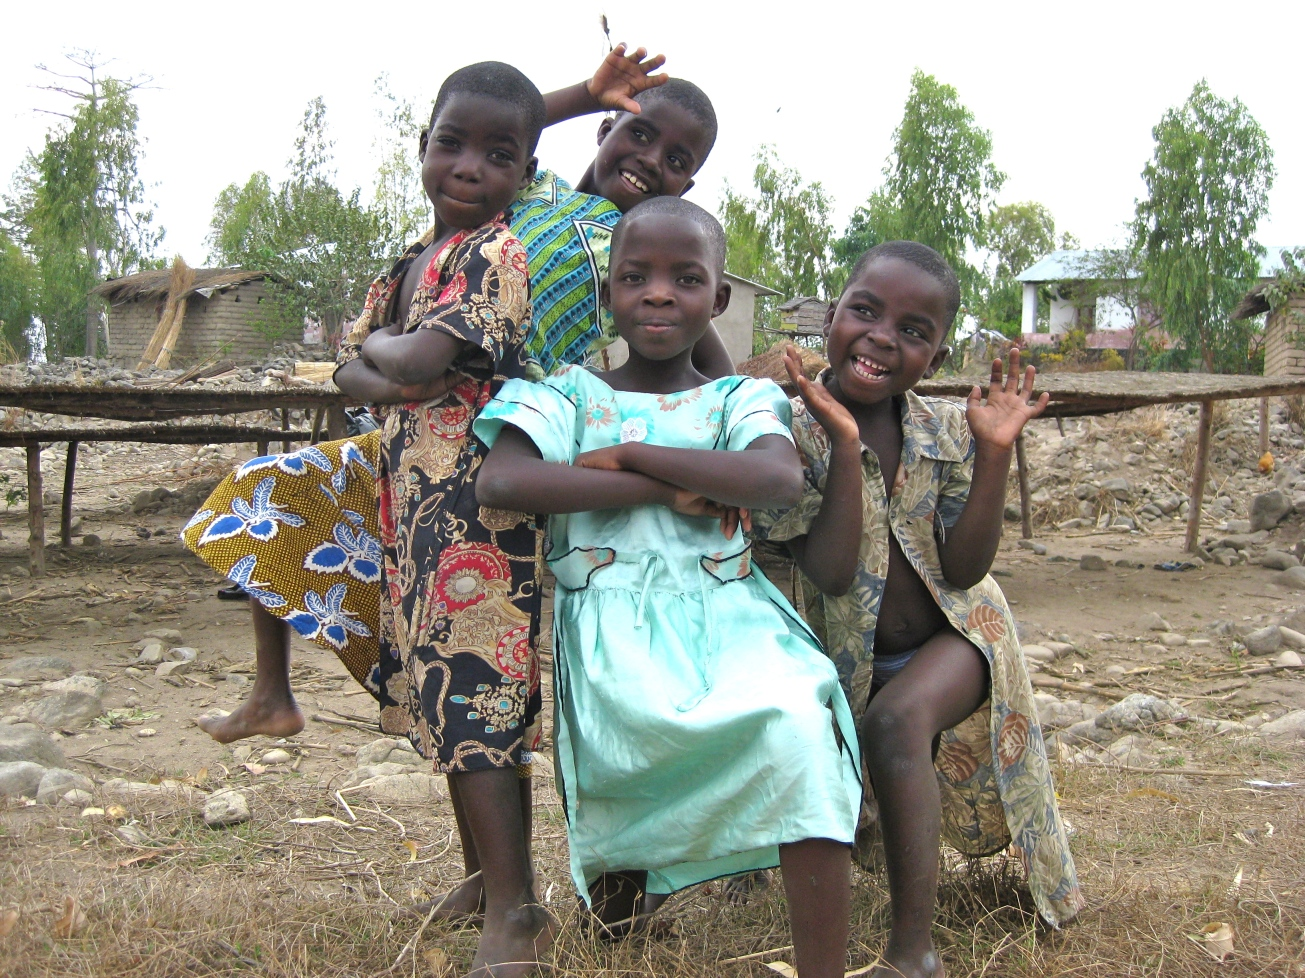 Likoma Island Kids posing for a photo